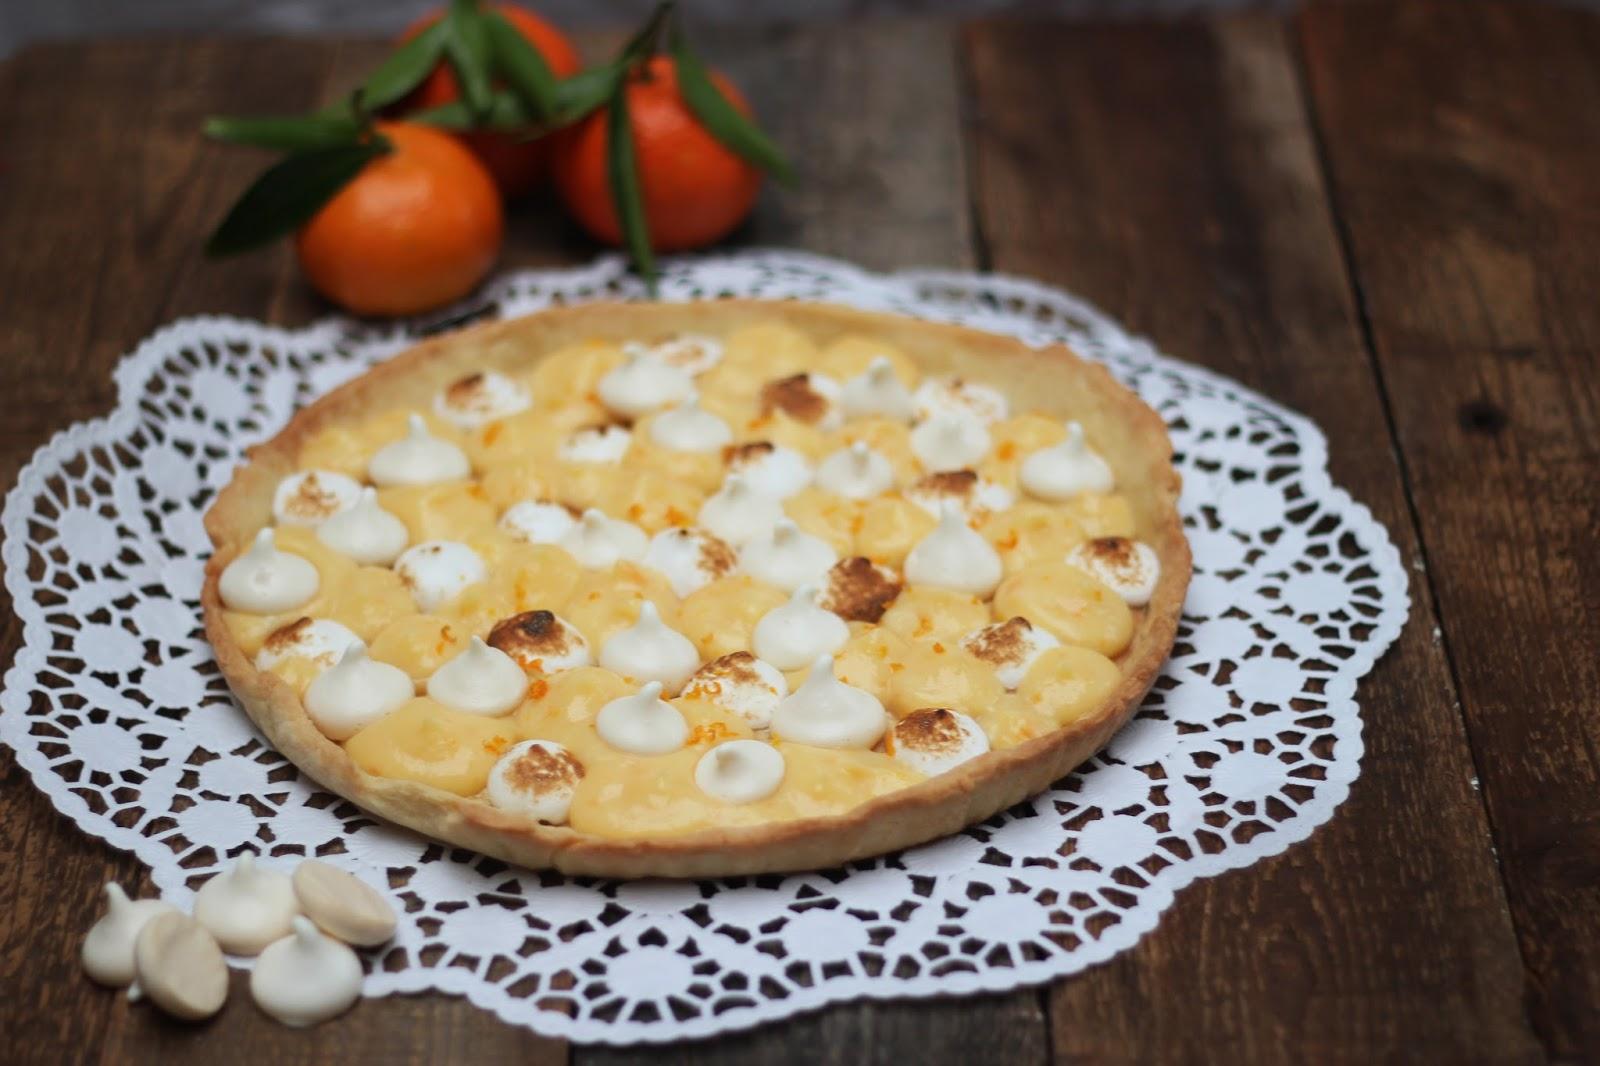 http://carnet-sucre.blogspot.com/2015/11/tarte-clementine-meringuee.html